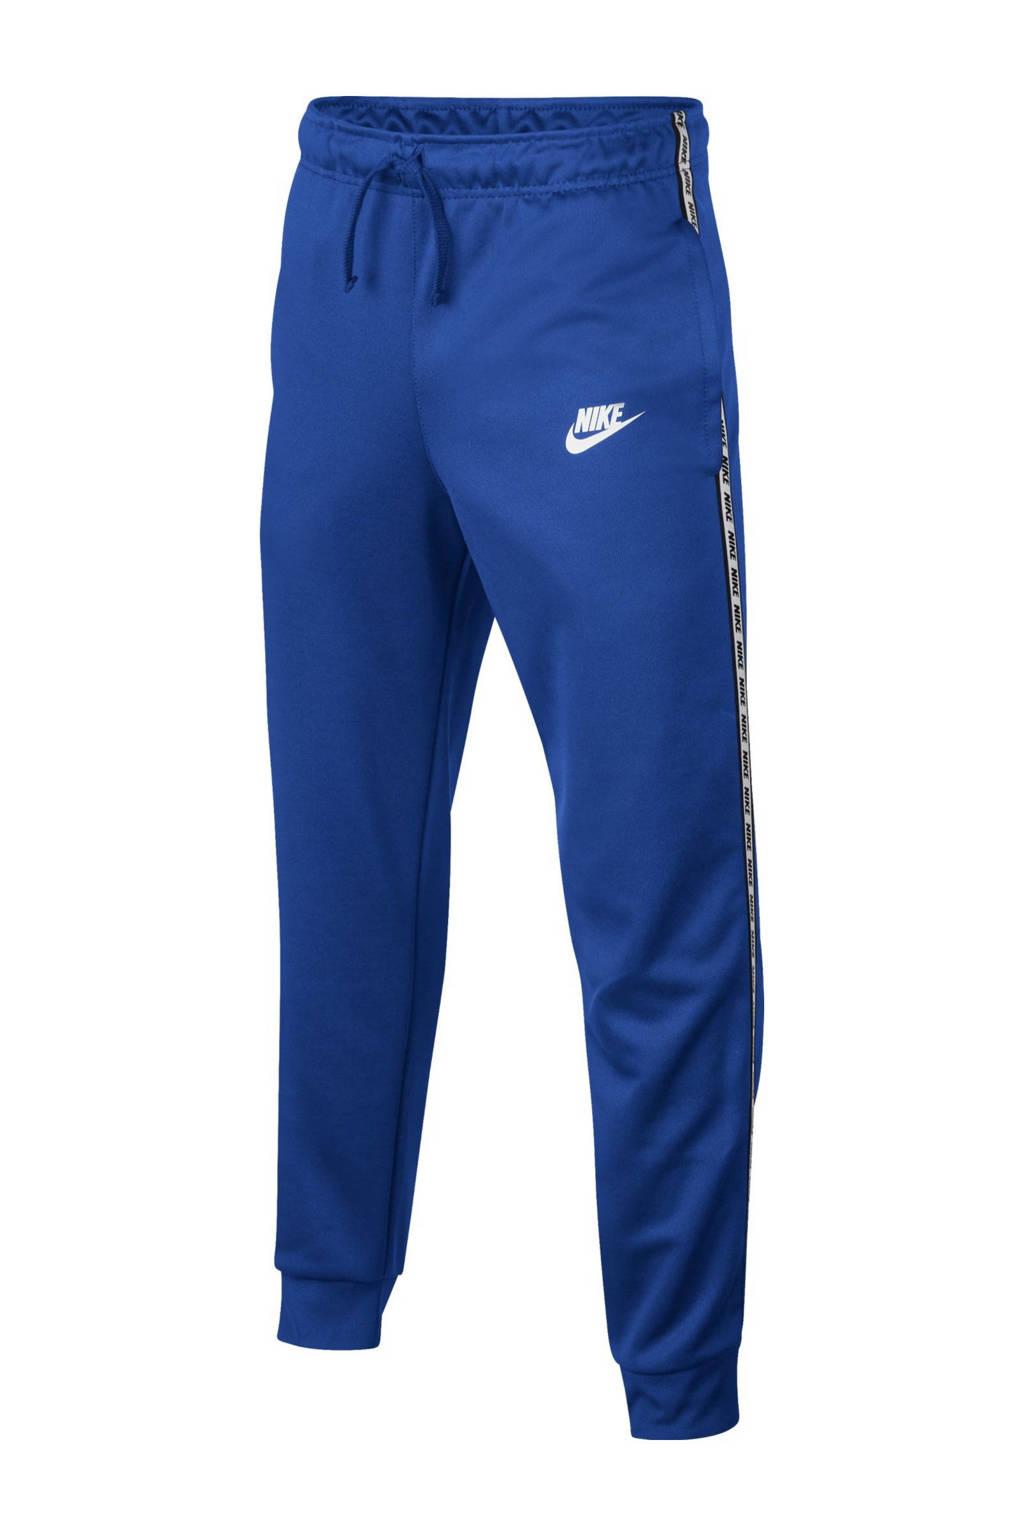 Nike   sportbroek met tekst blauw, Blauw